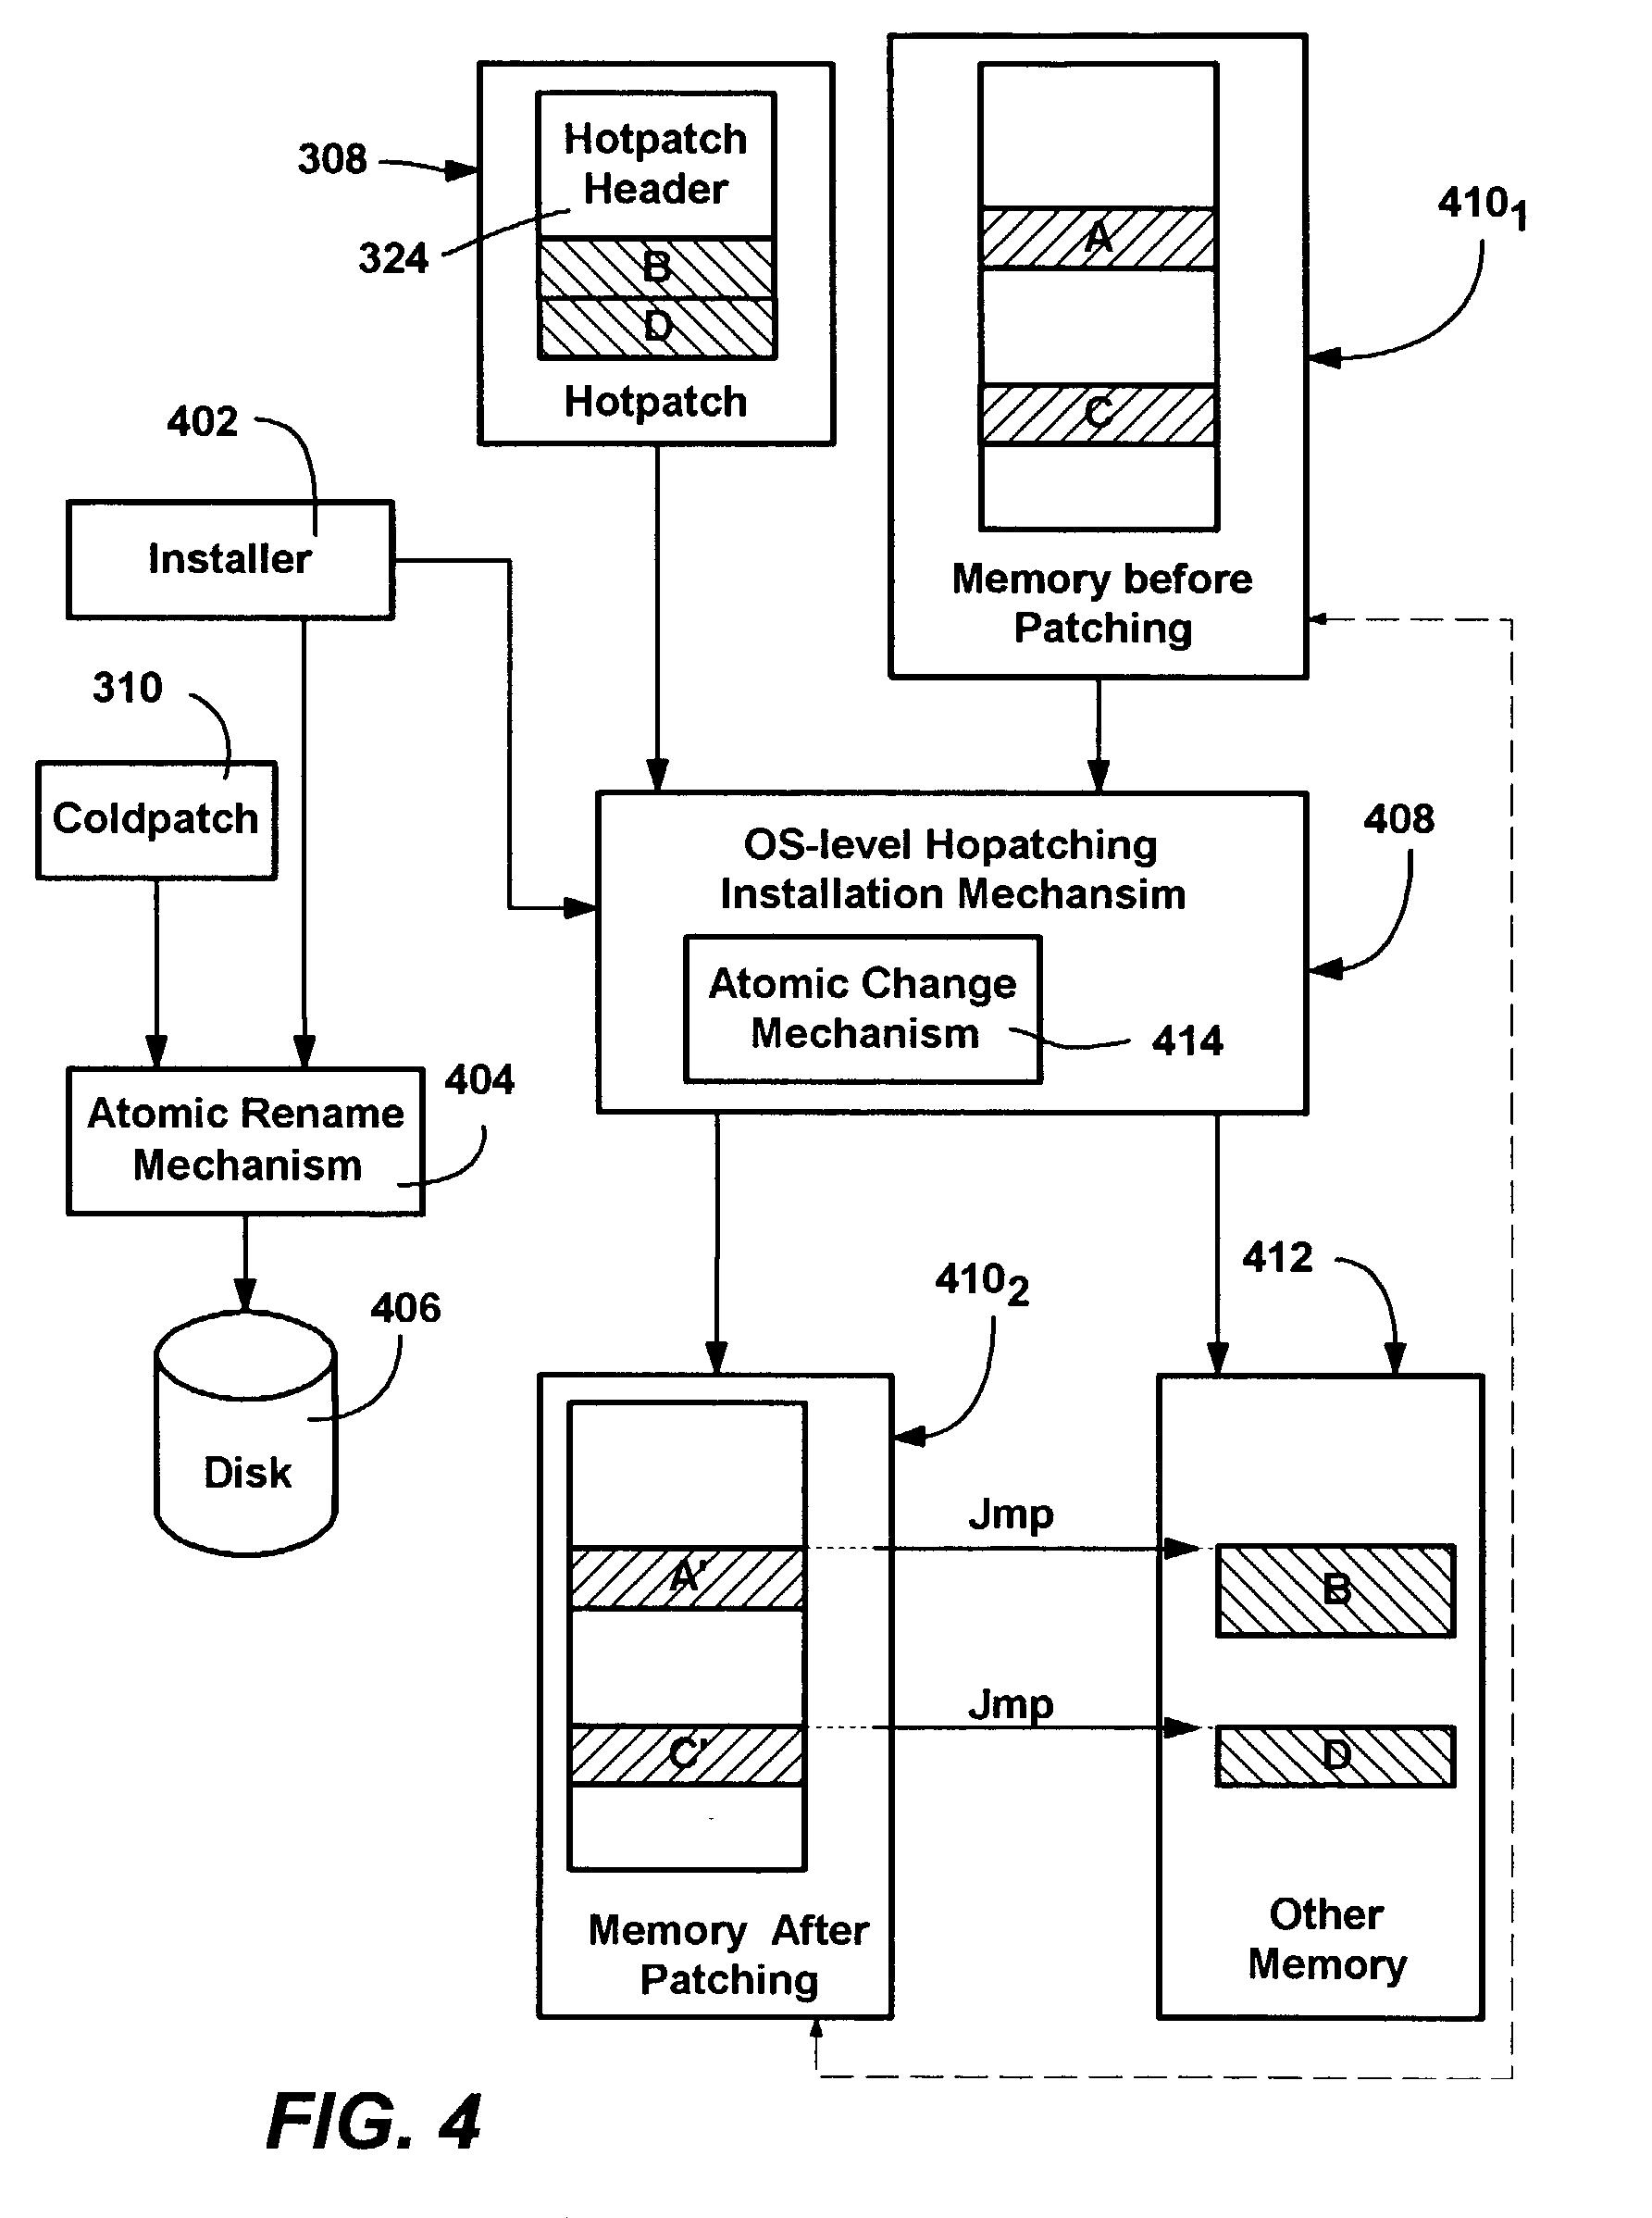 Nexon Car Alarm System Wiring Diagram Schematics And Diagrams